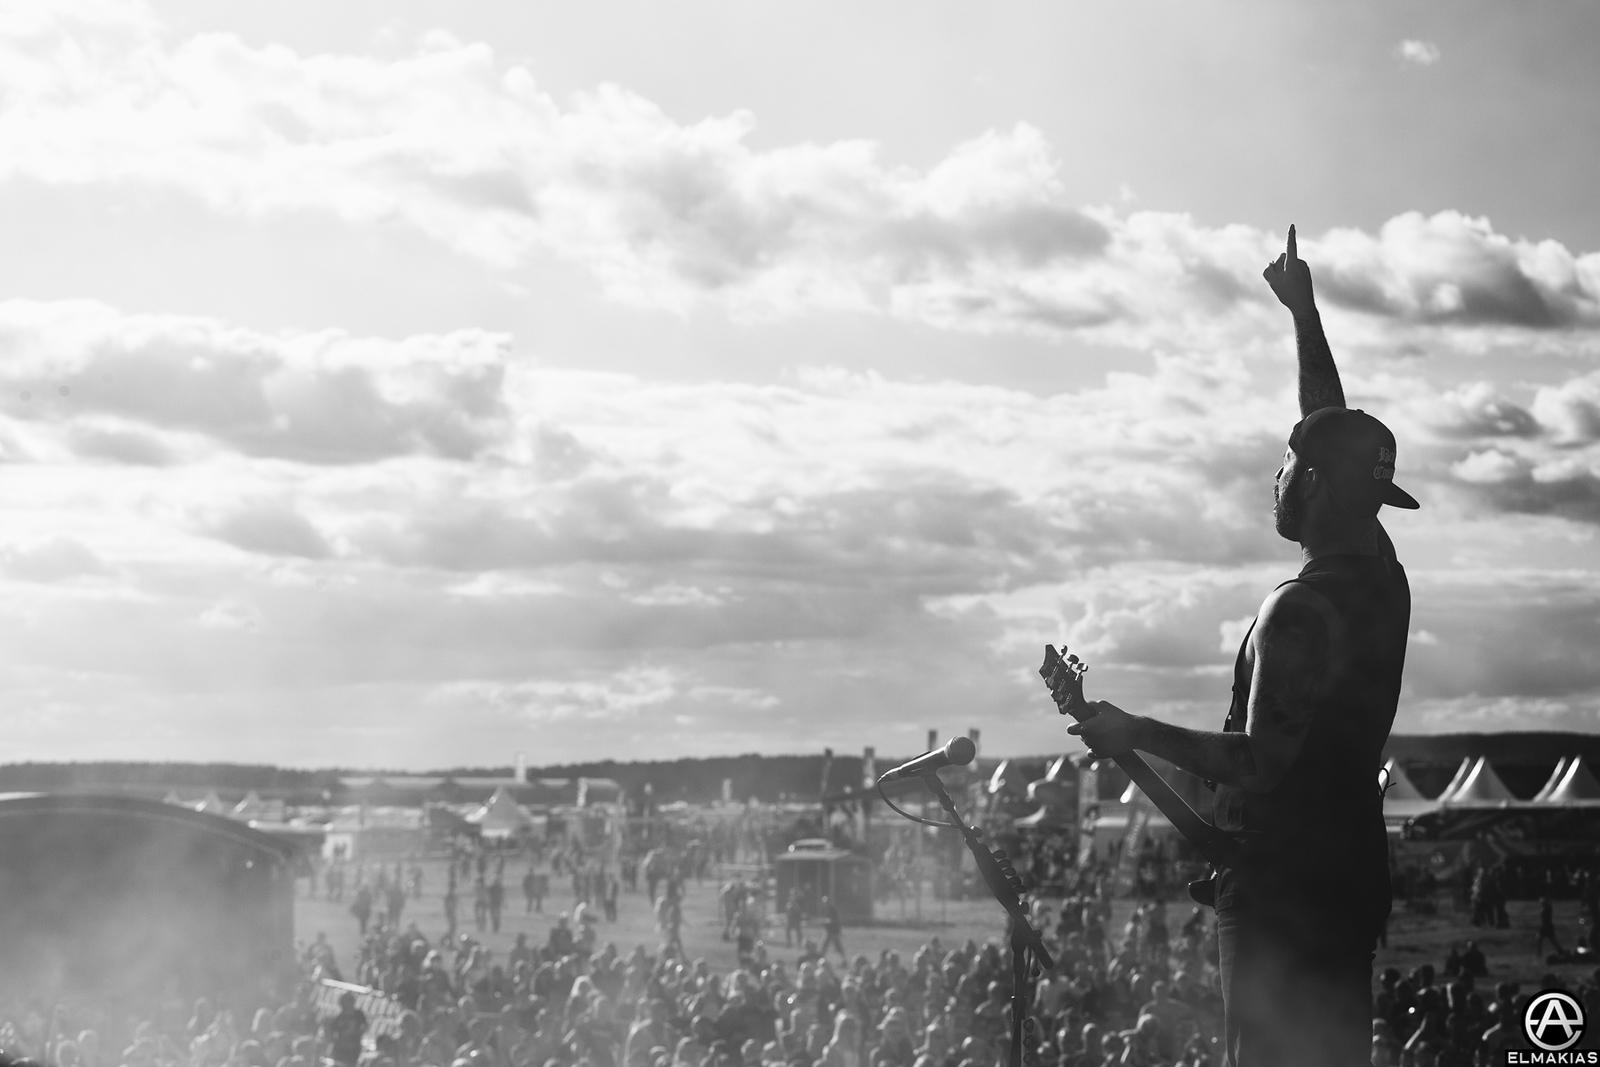 Kevin Skaff of A Day To Remember at Bravalla Festival in Norrköping, Sweden